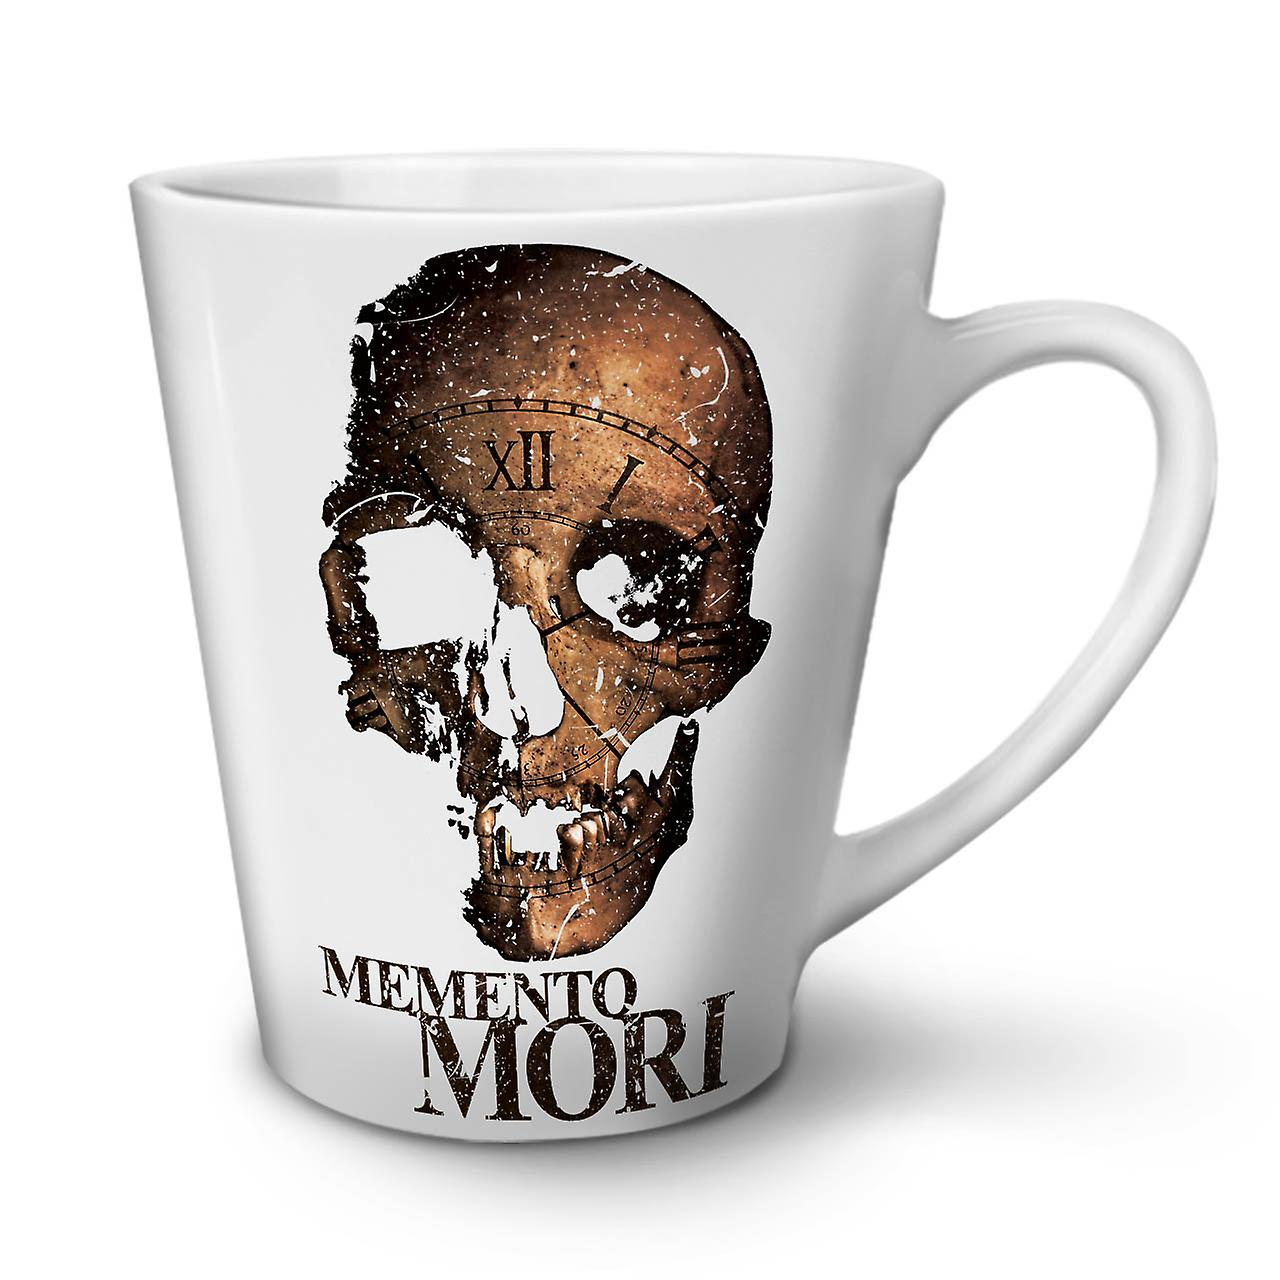 12 Tasse Latte En Mori Céramique OzWellcoda Memento Café Mort Nouvelle Blanche PiuOZkXT